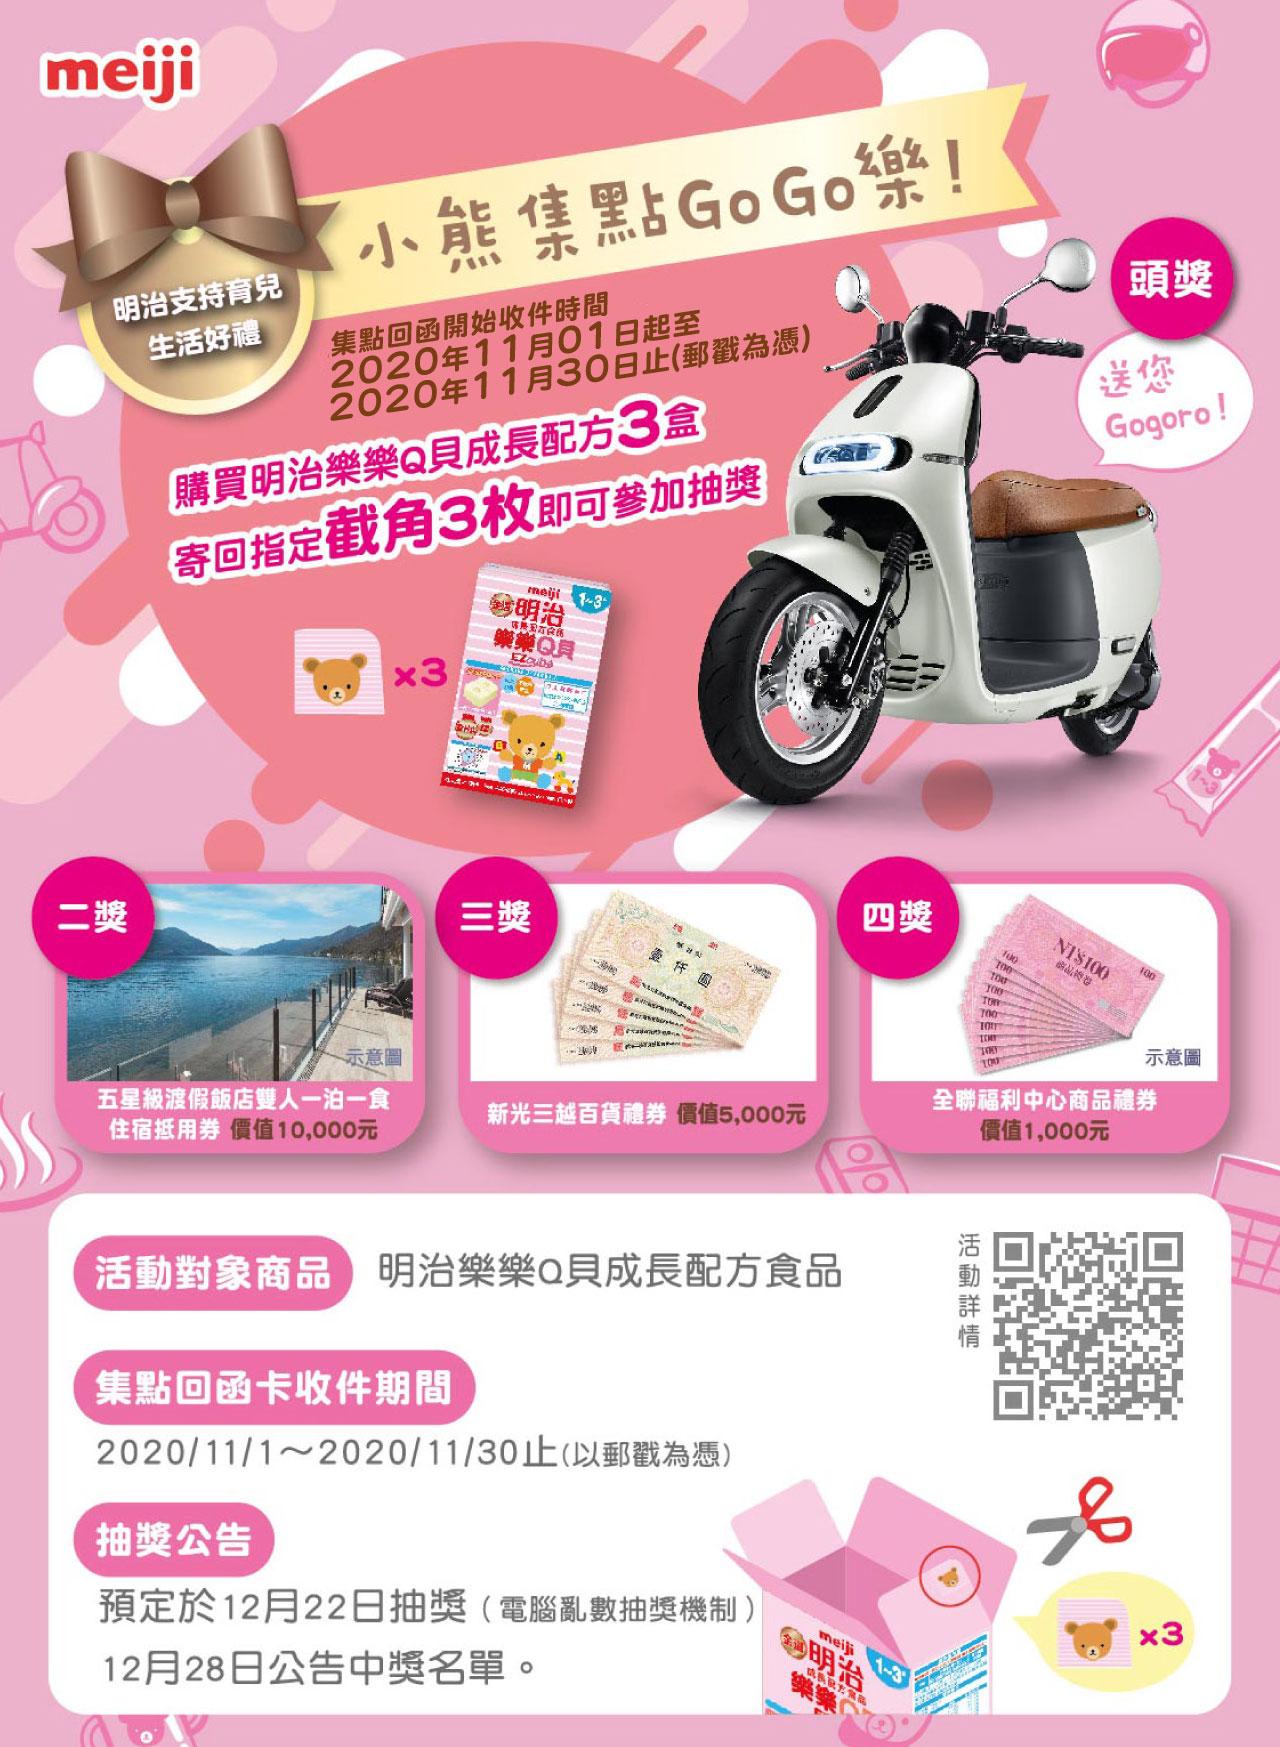 proimages/news/2020/20200907_明治小熊集點GoGo樂-1.jpg